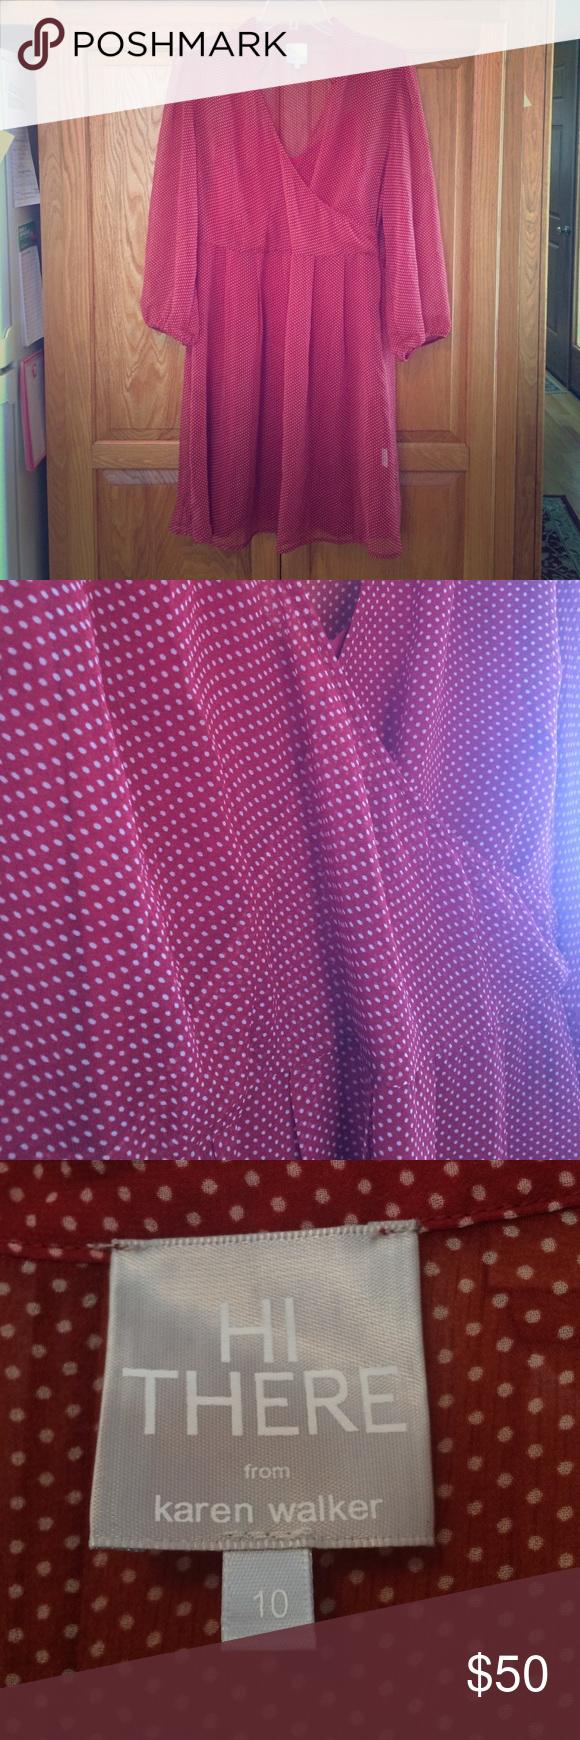 Red polka dot dress red polka dot dress karen walker and